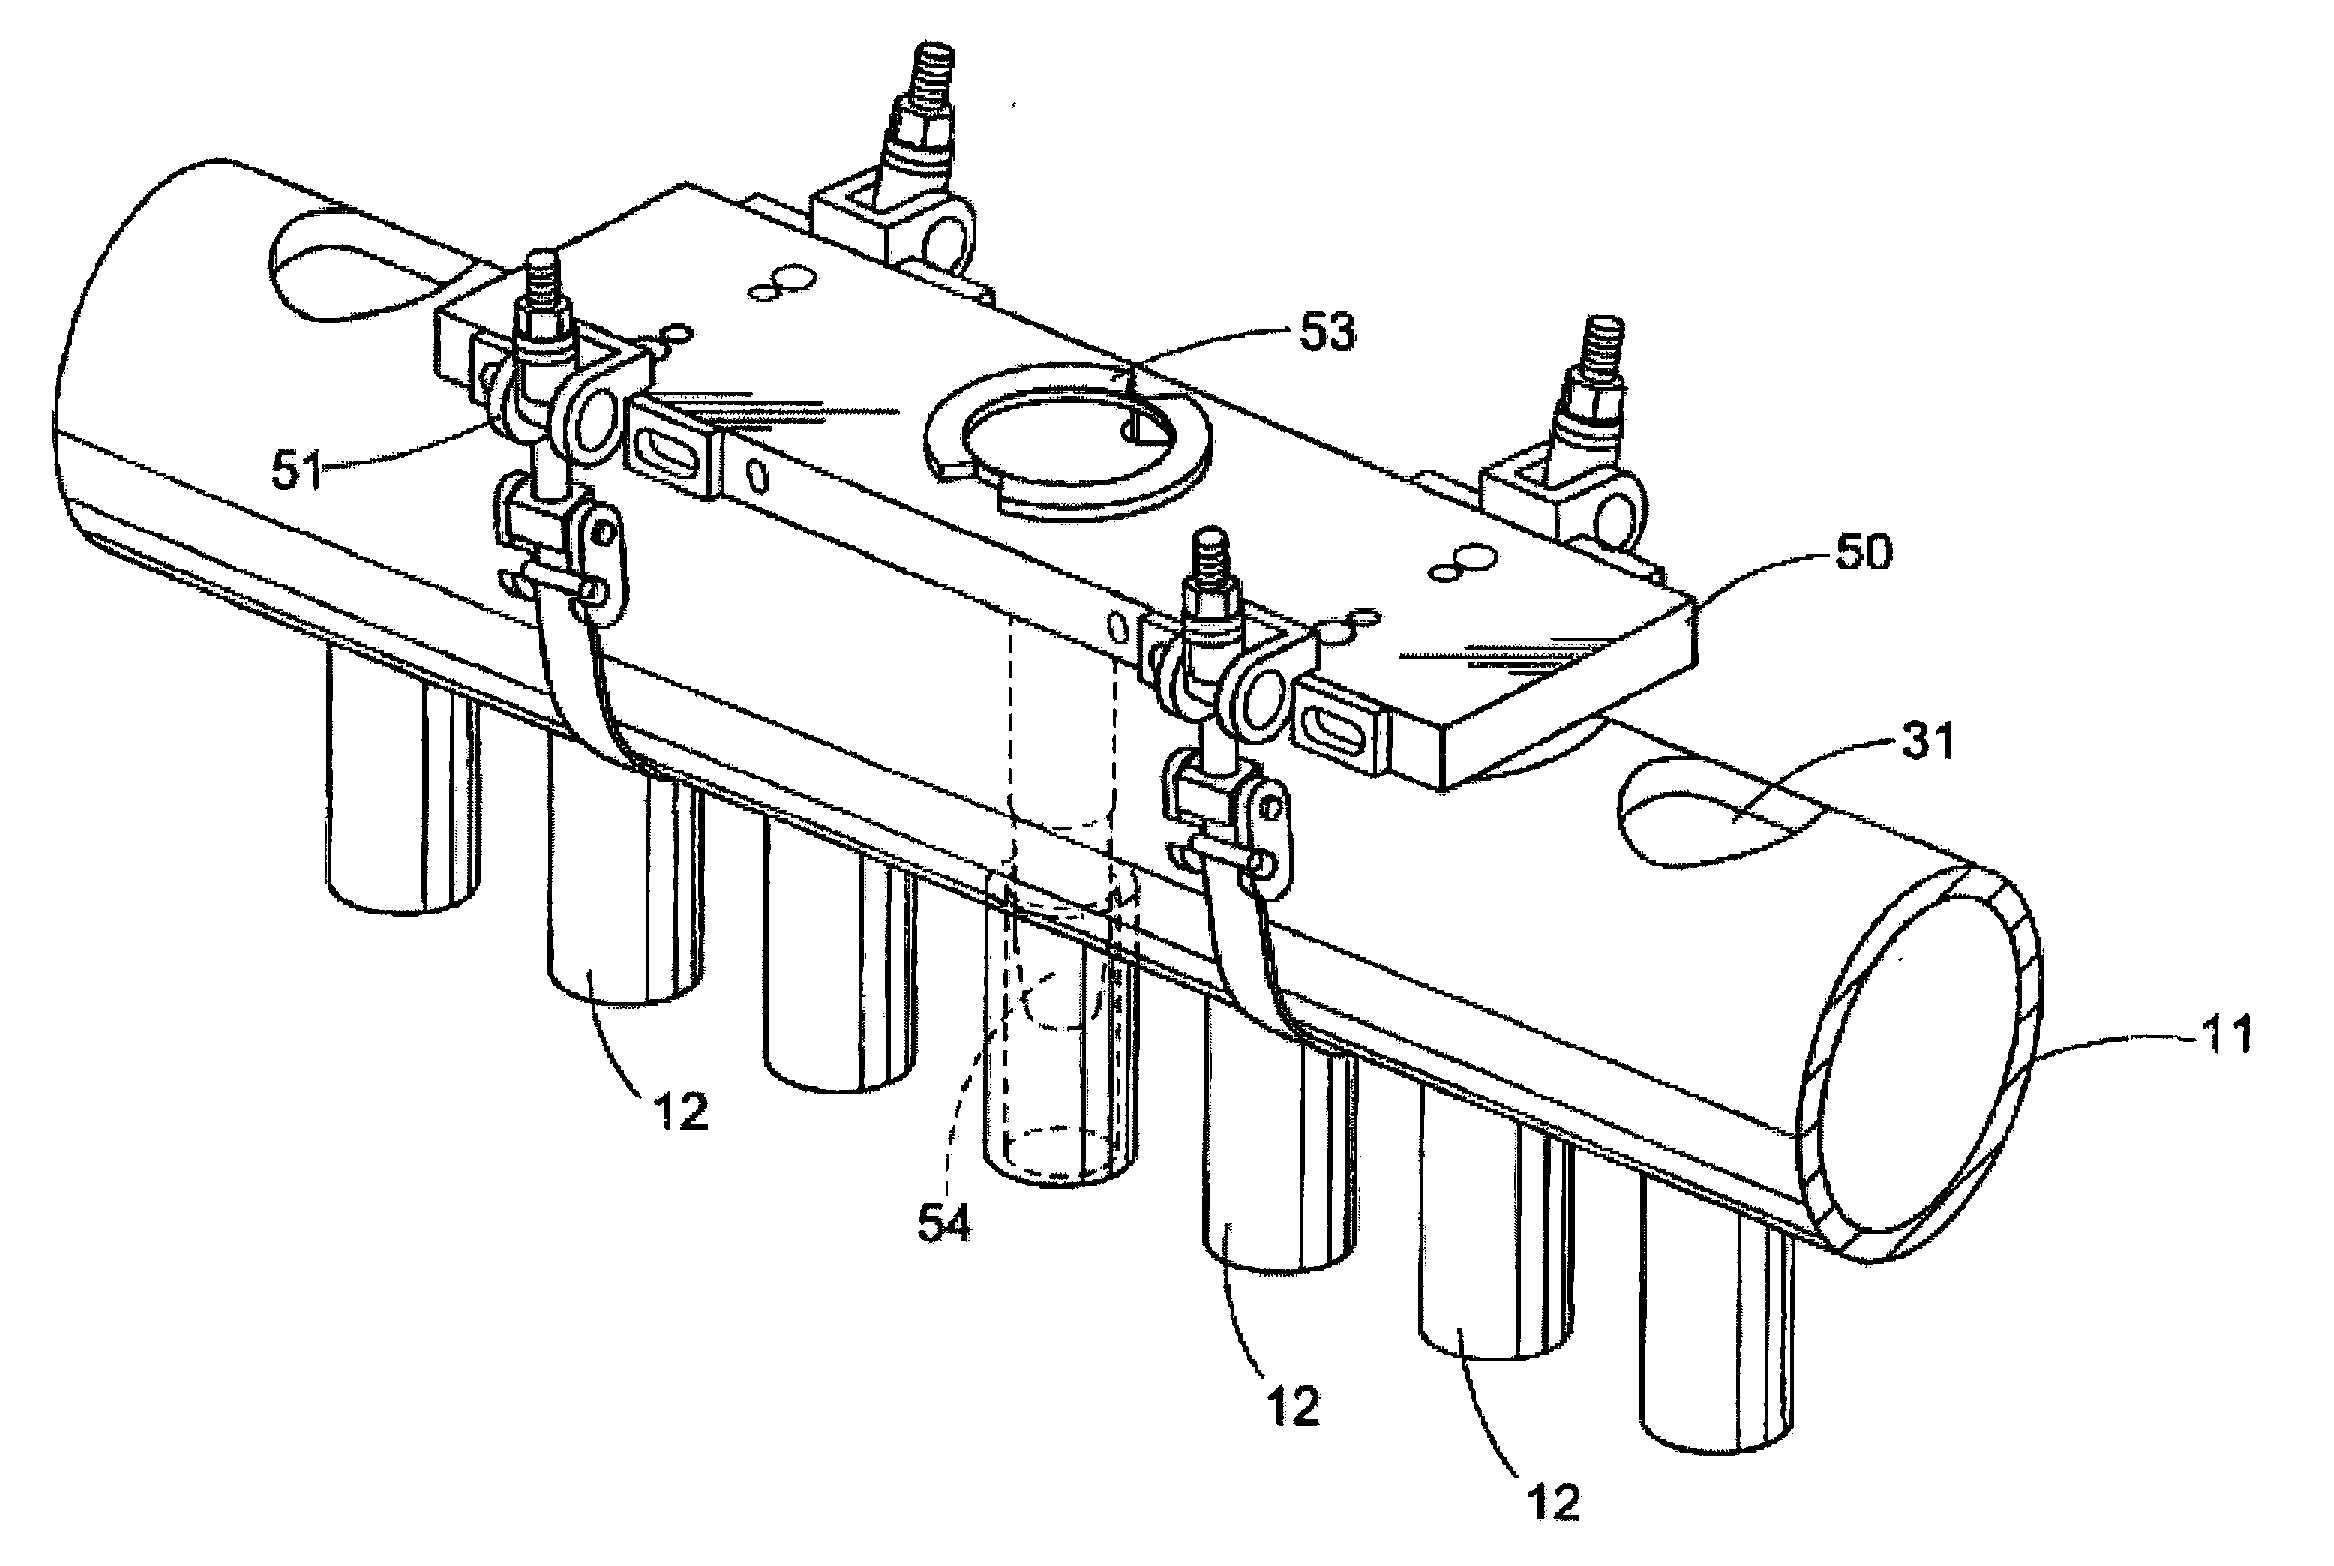 2004 toyota sienna wiring harness diagram html